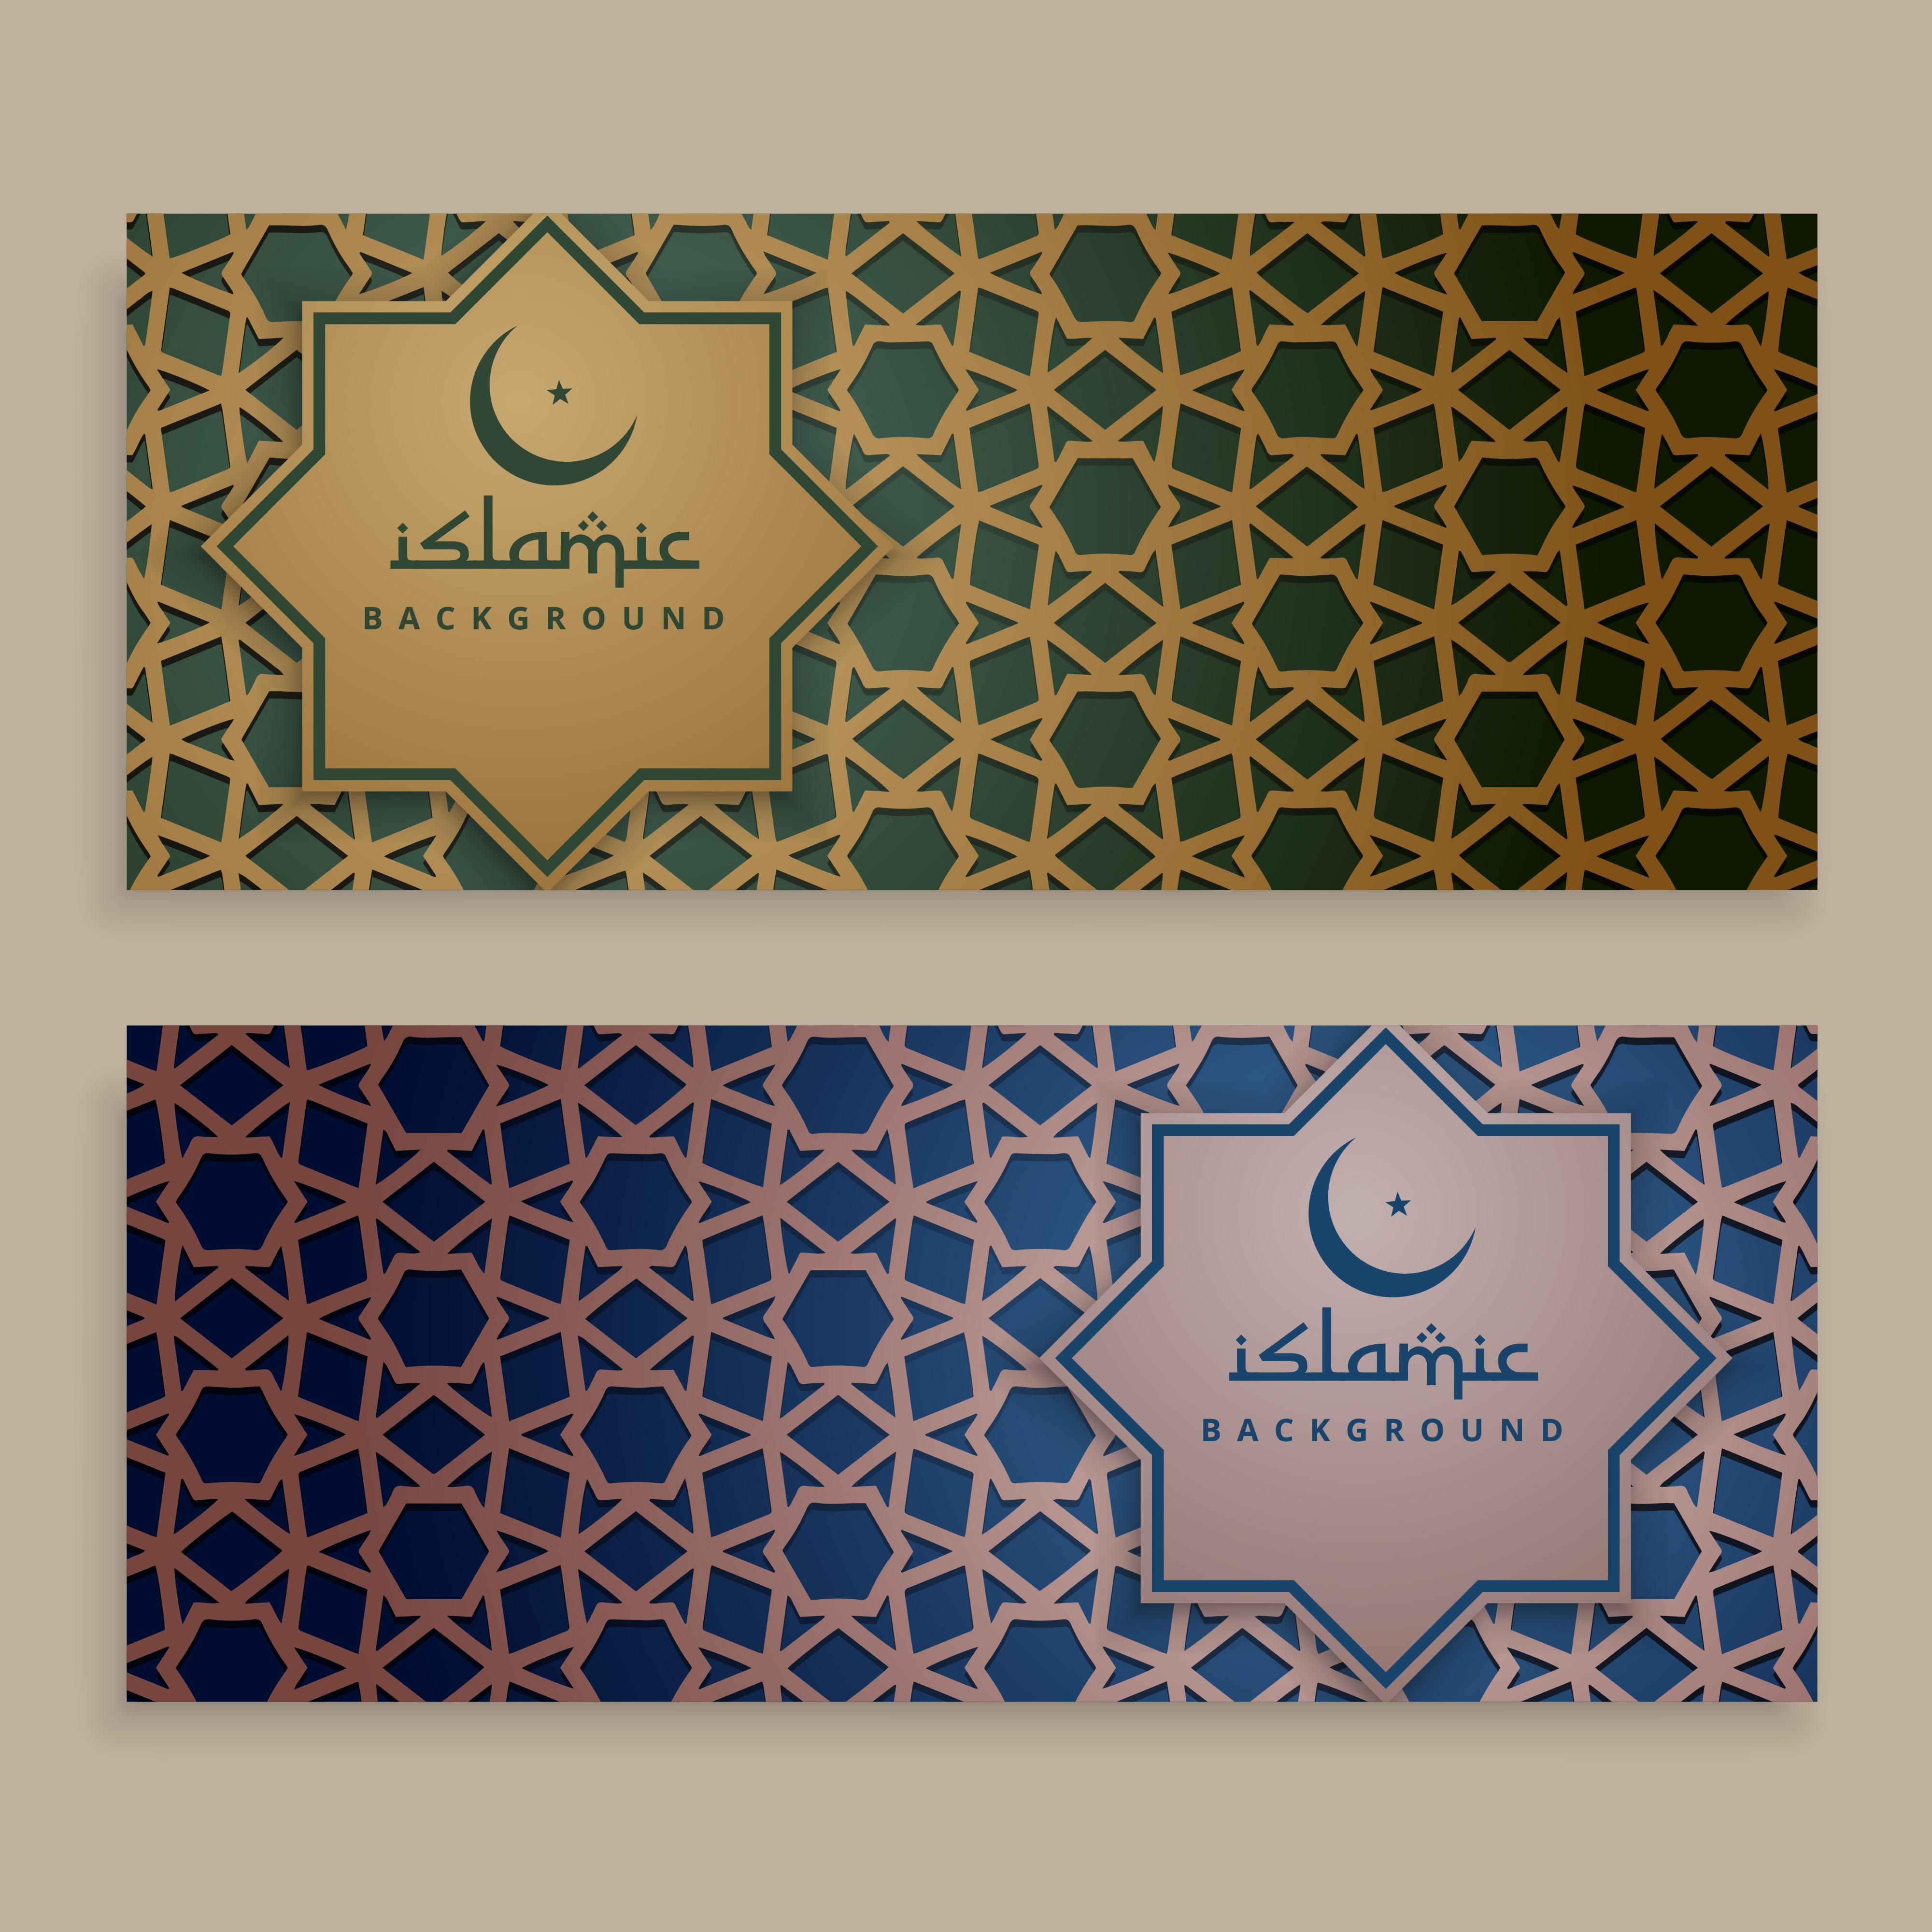 Islamic Banner Free Vector Art 18020 Free Downloads